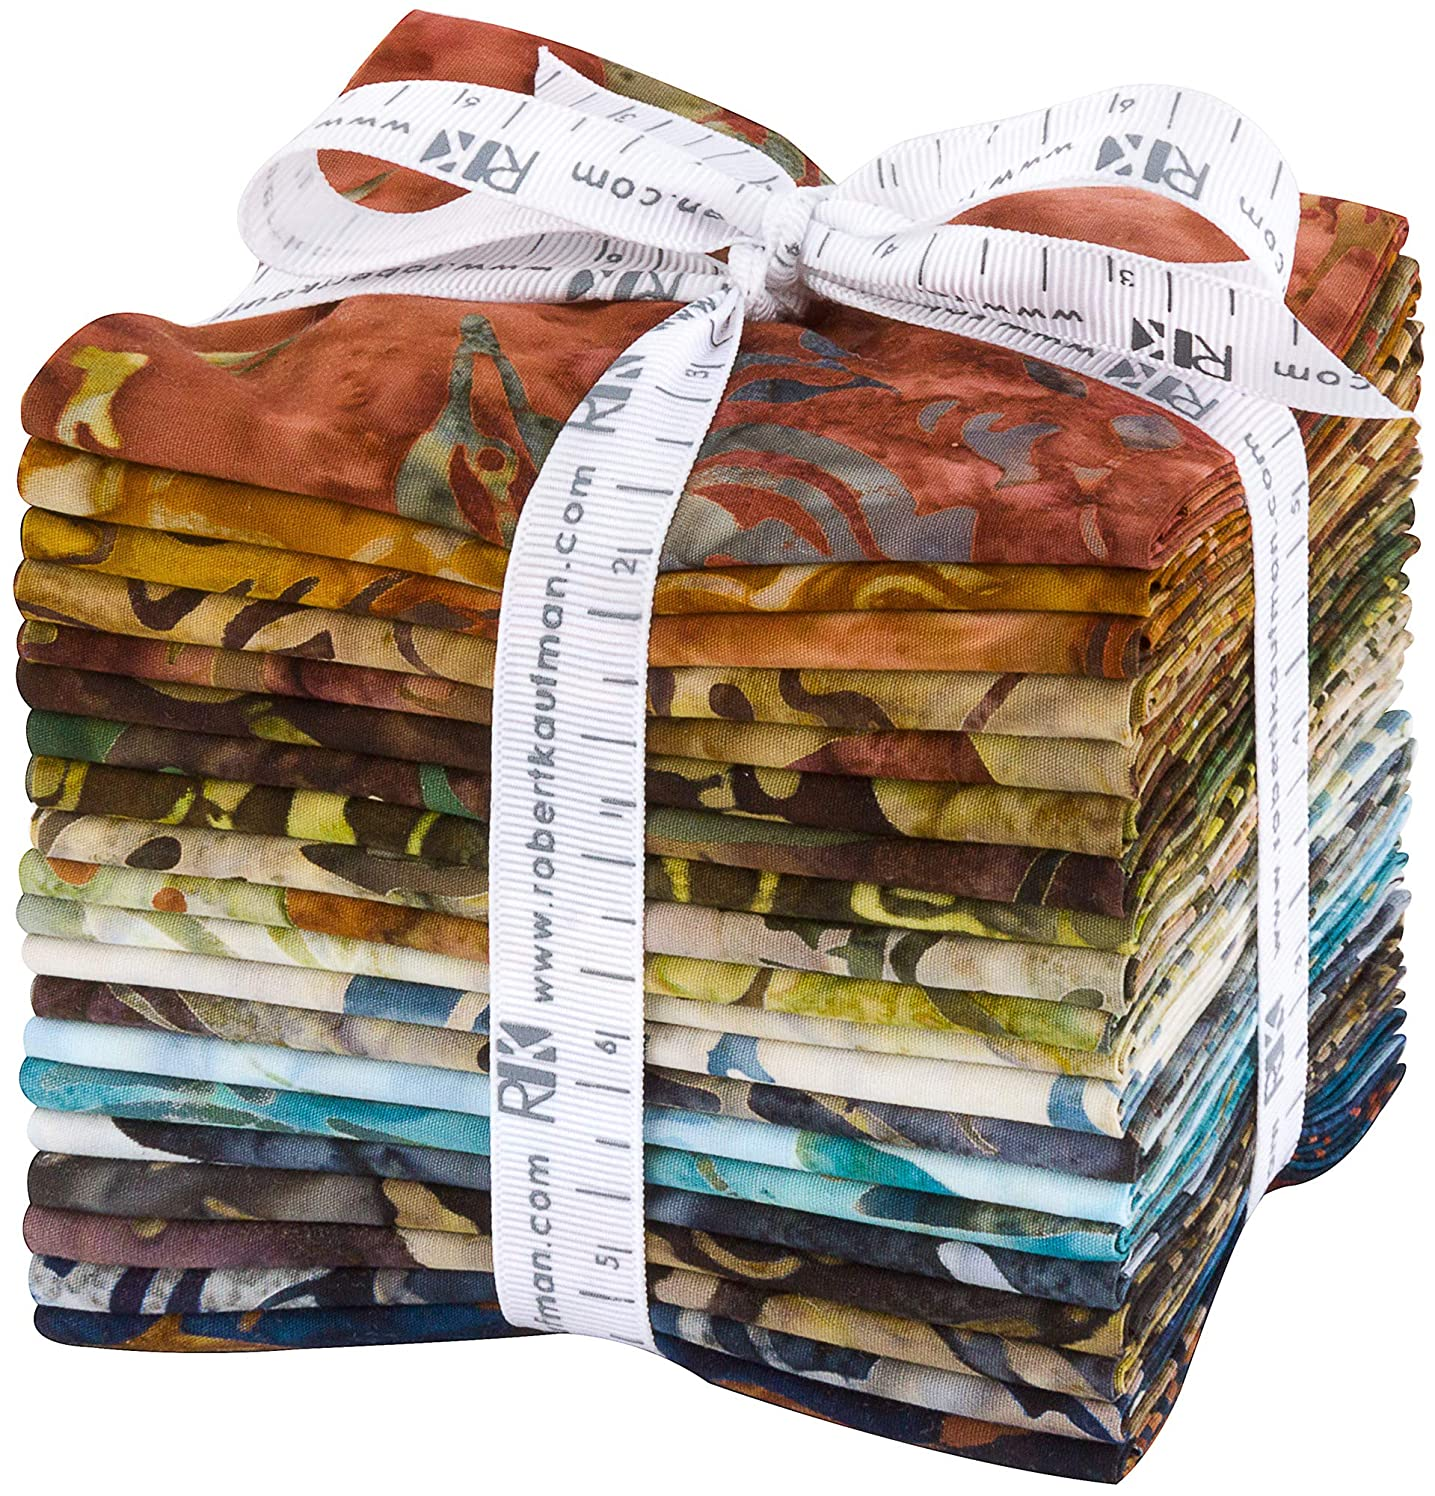 Lunn Studios Artisan Batiks Wildlife Sanctuary 5 20 Fat Quarters Robert Kaufman Fabrics FQ-1446-20